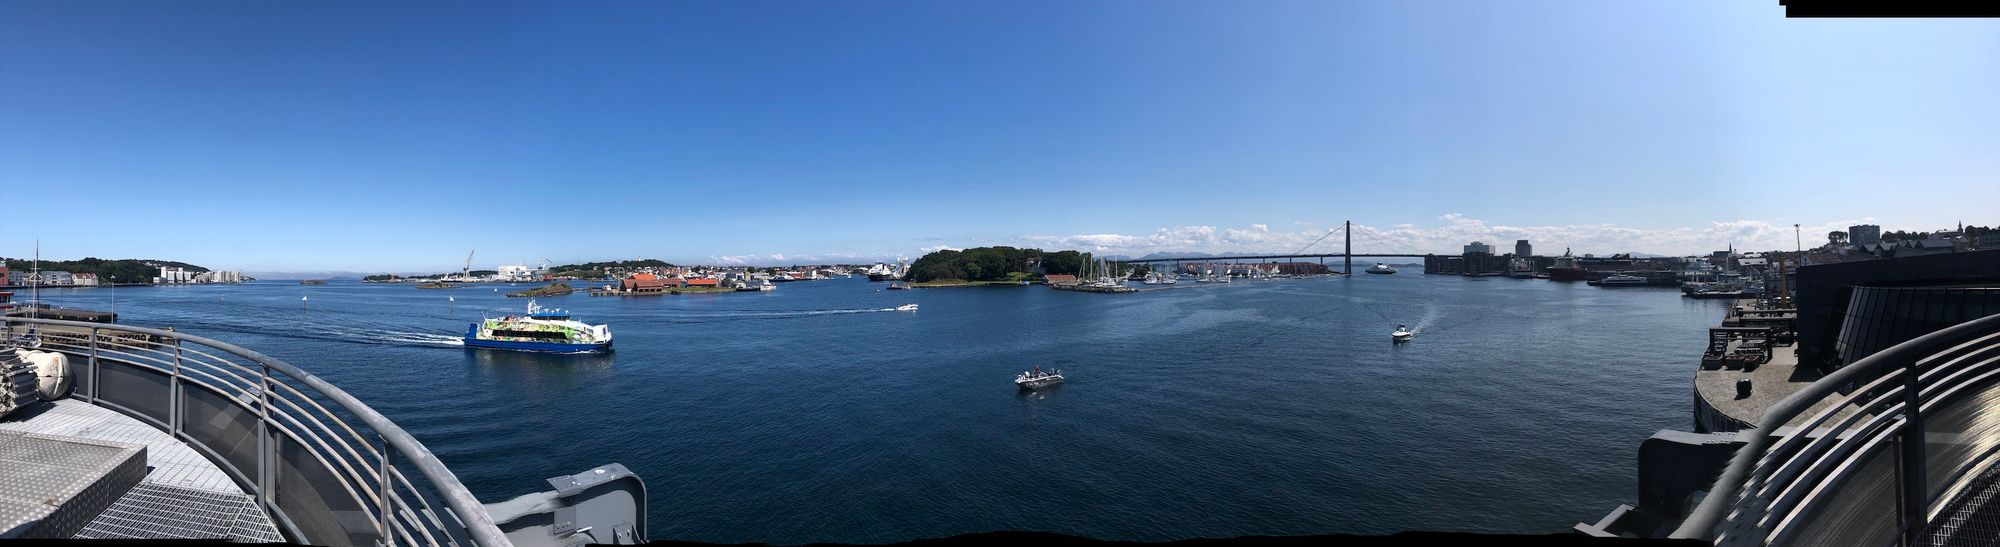 Impressions of Europe - Stavanger